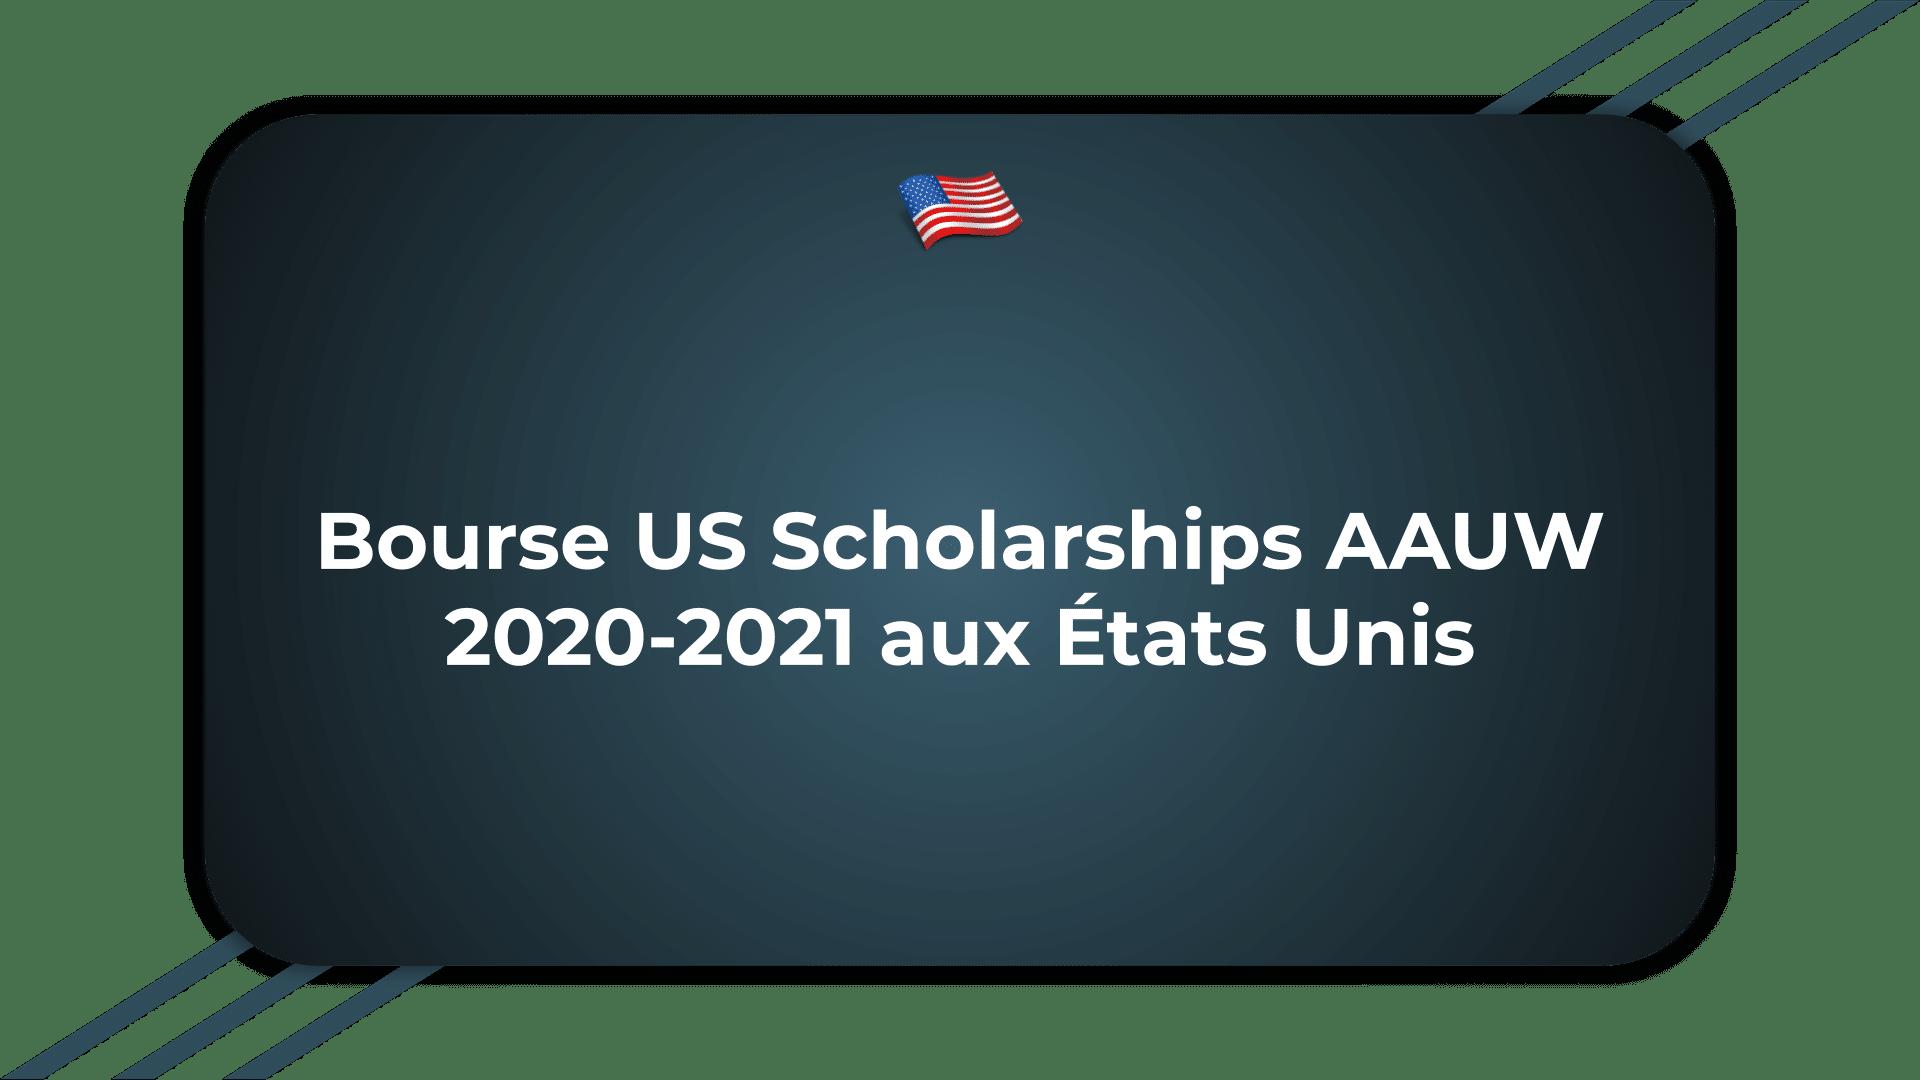 Bourse US Scholarships AAUW